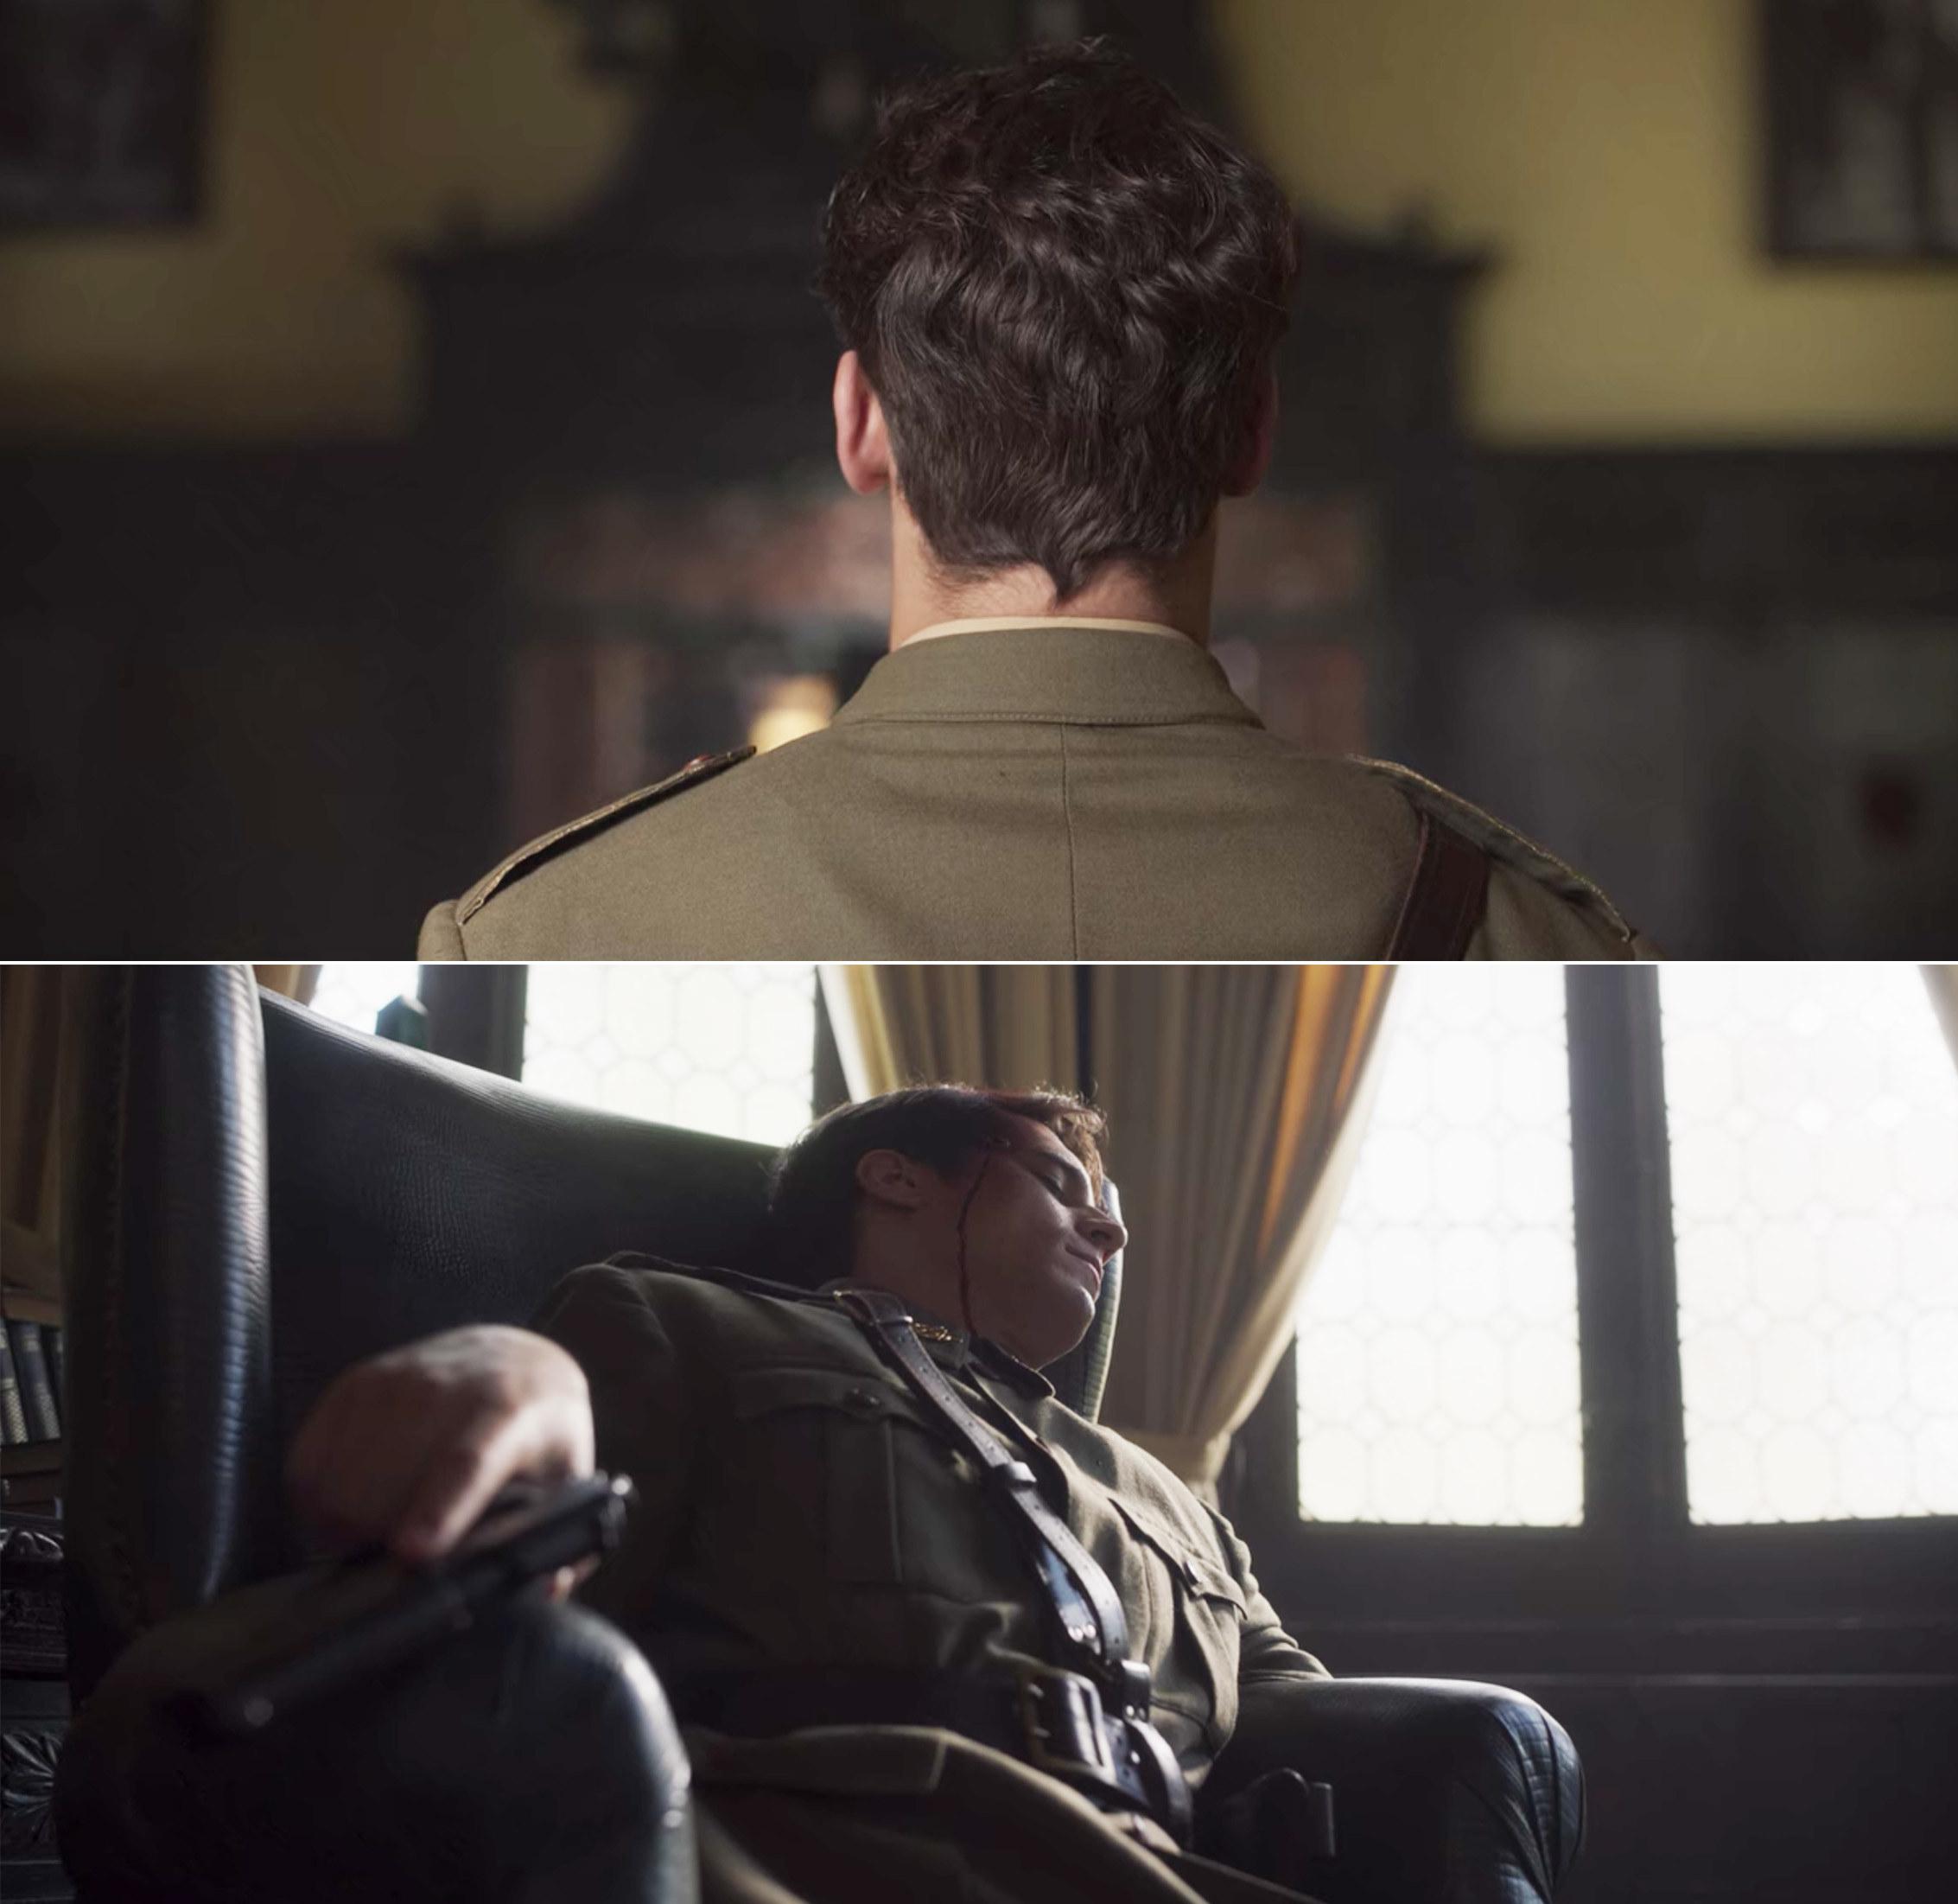 Carlos sitting in a chair, bleeding from his head